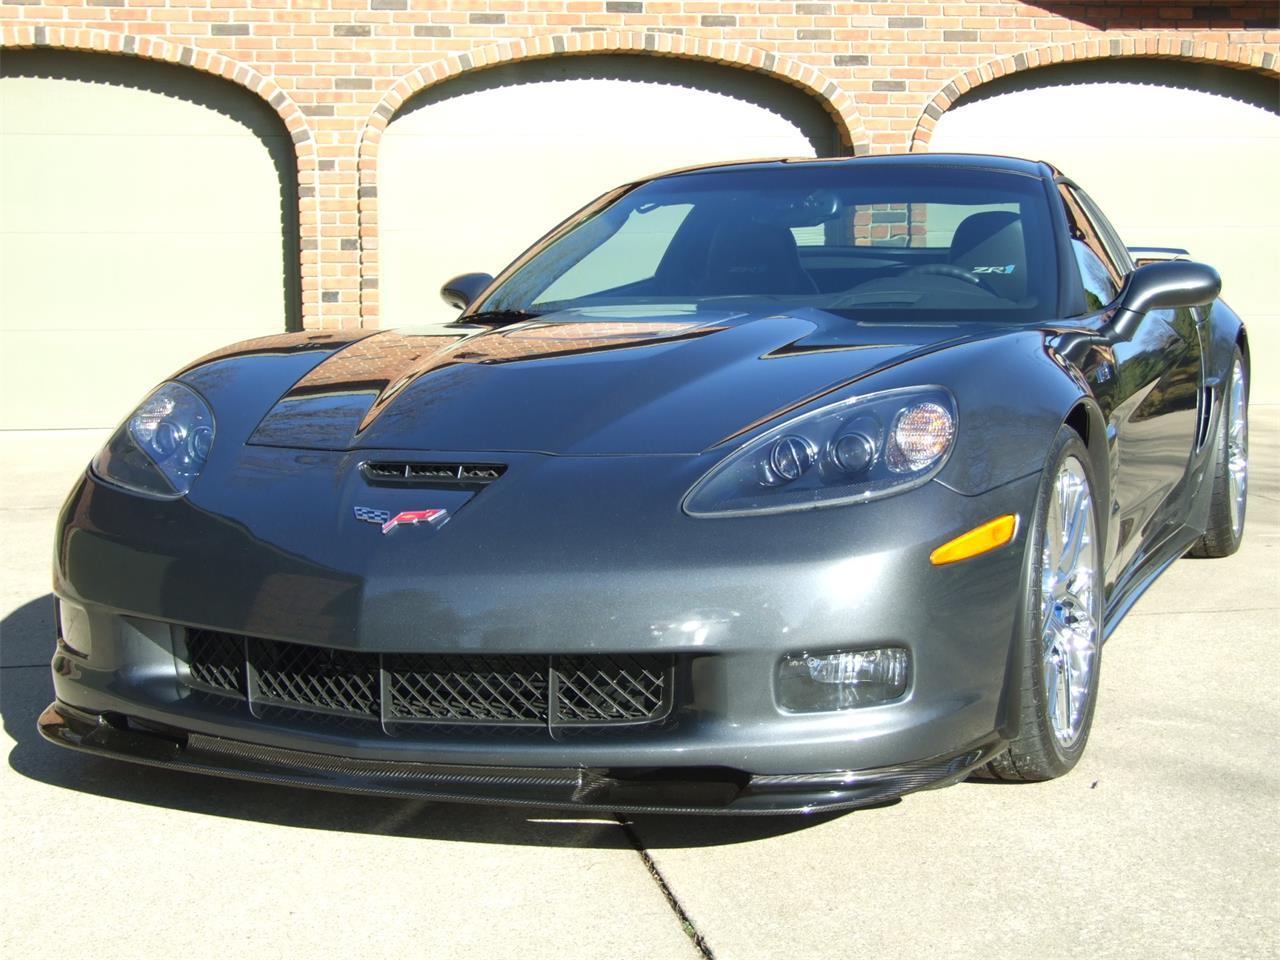 Large Picture of '09 Chevrolet Corvette ZR1 - $75,000.00 - DJBI